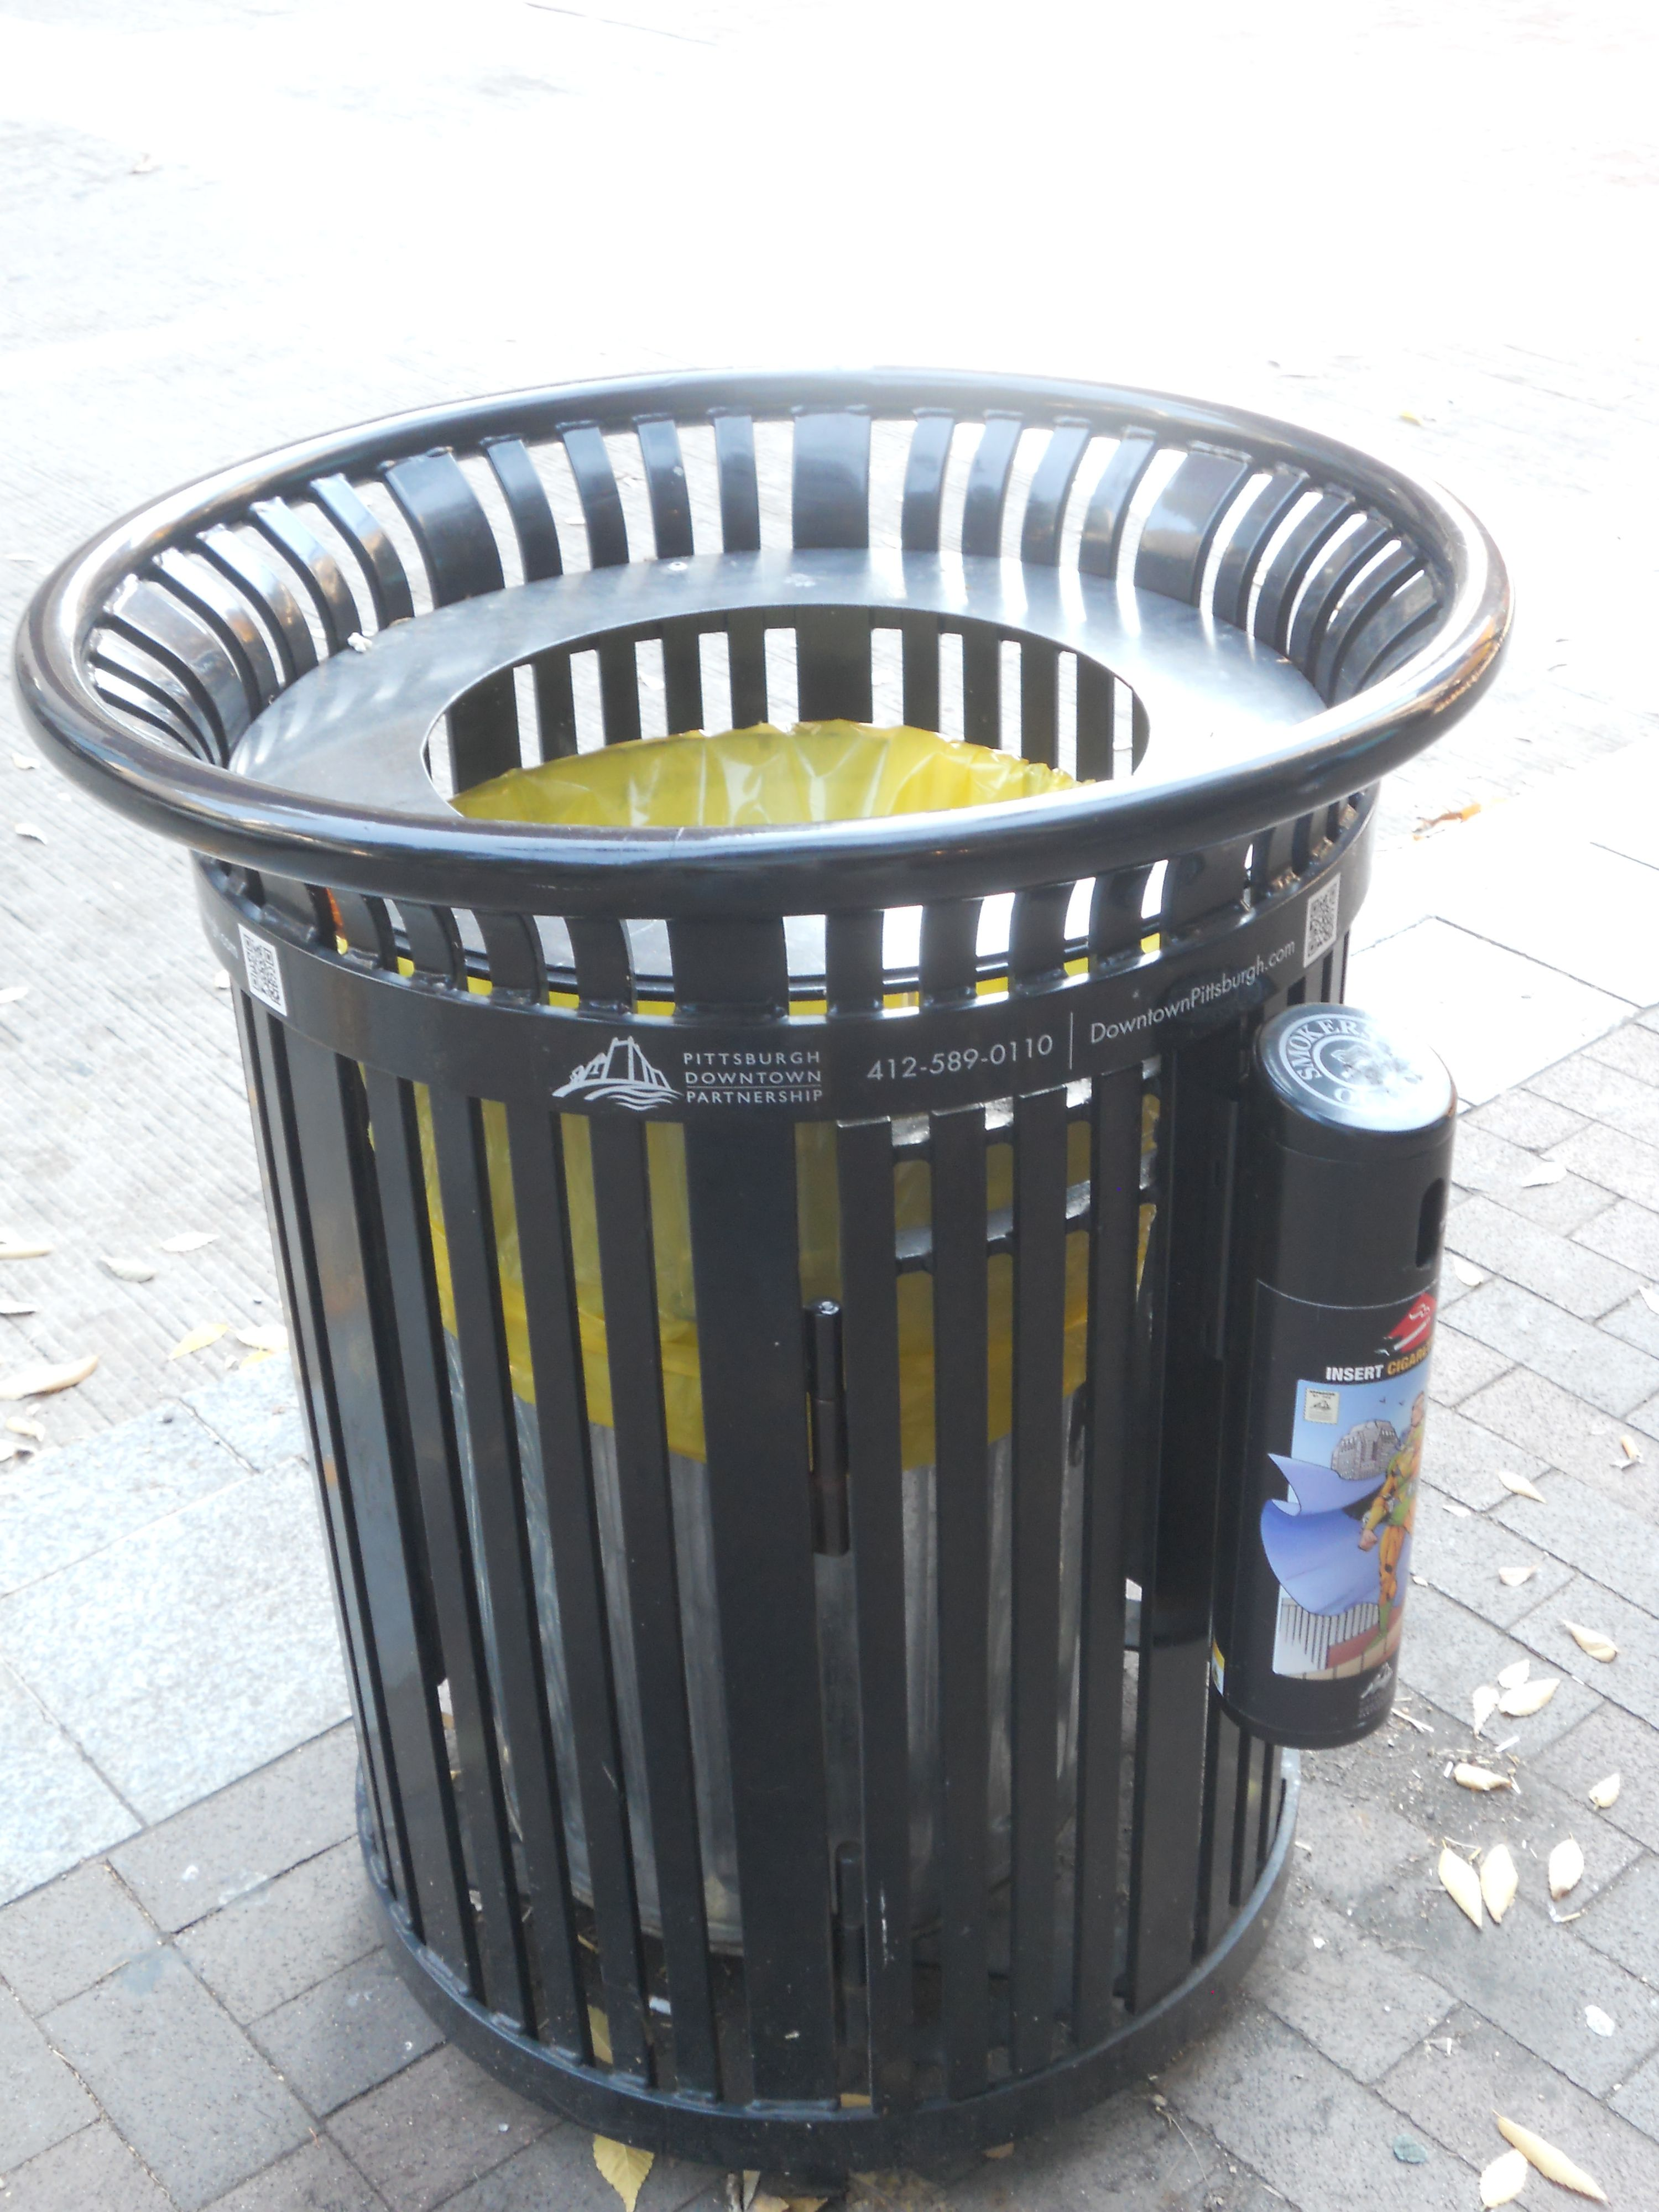 Good Public Trash Cans In Pittsburgh Bins Street